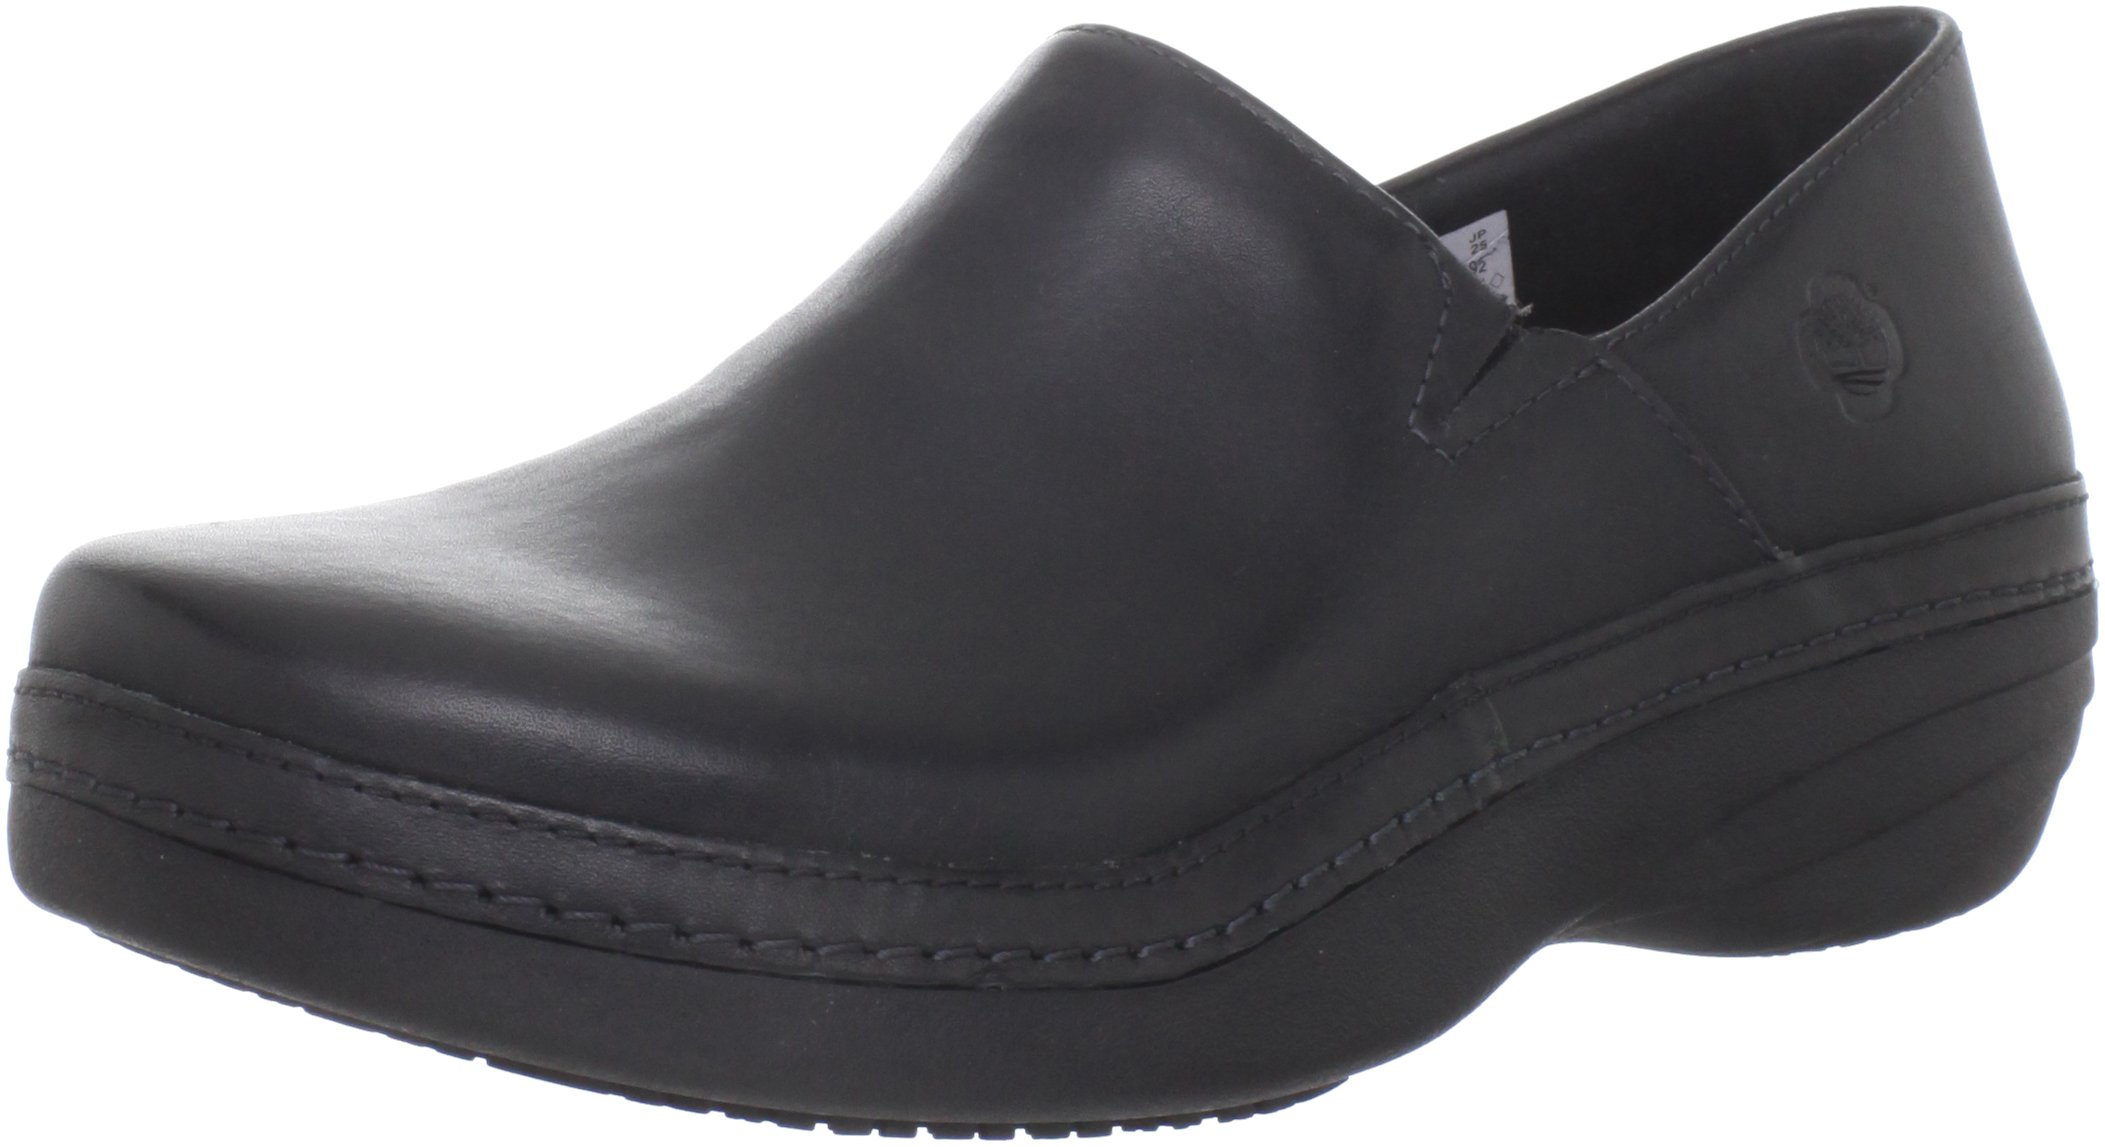 Timberland PRO Women's Renova Slip-On,Black,7 M US